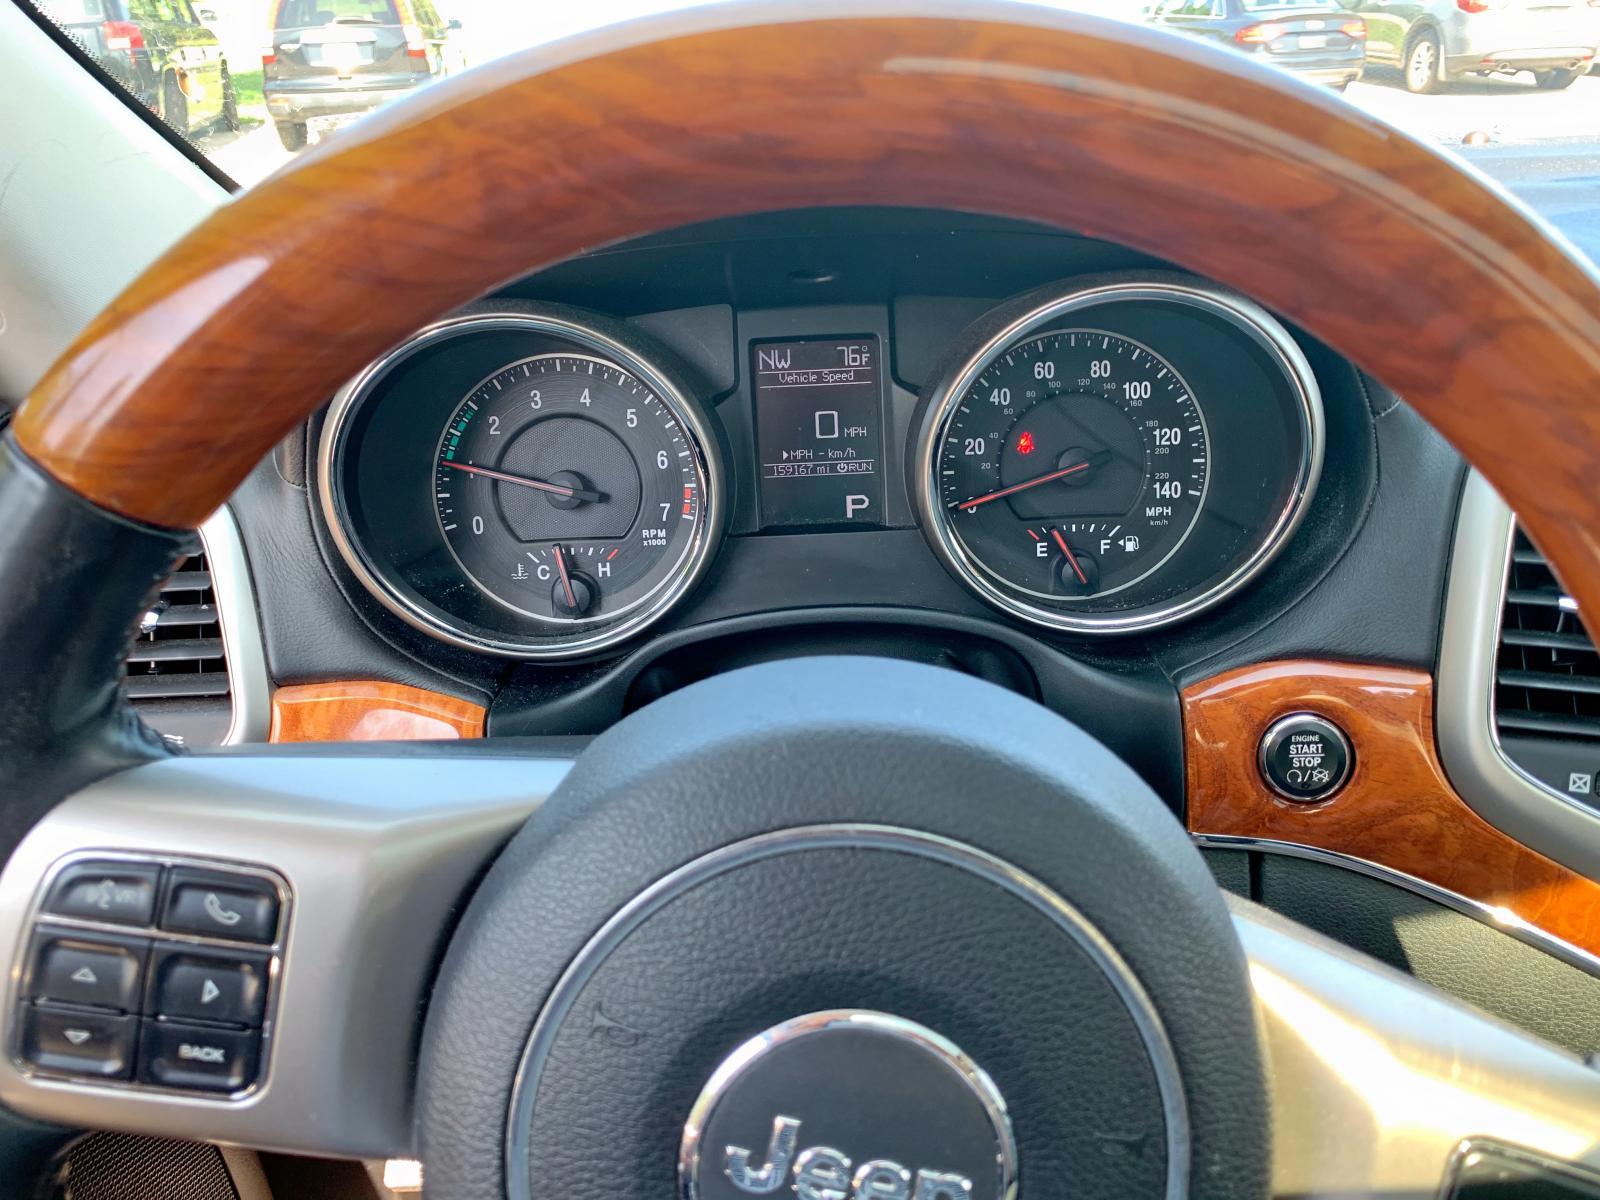 1J4RR6GG0BC669268 - 2011 Jeep Grand Cher 3.6L inside view